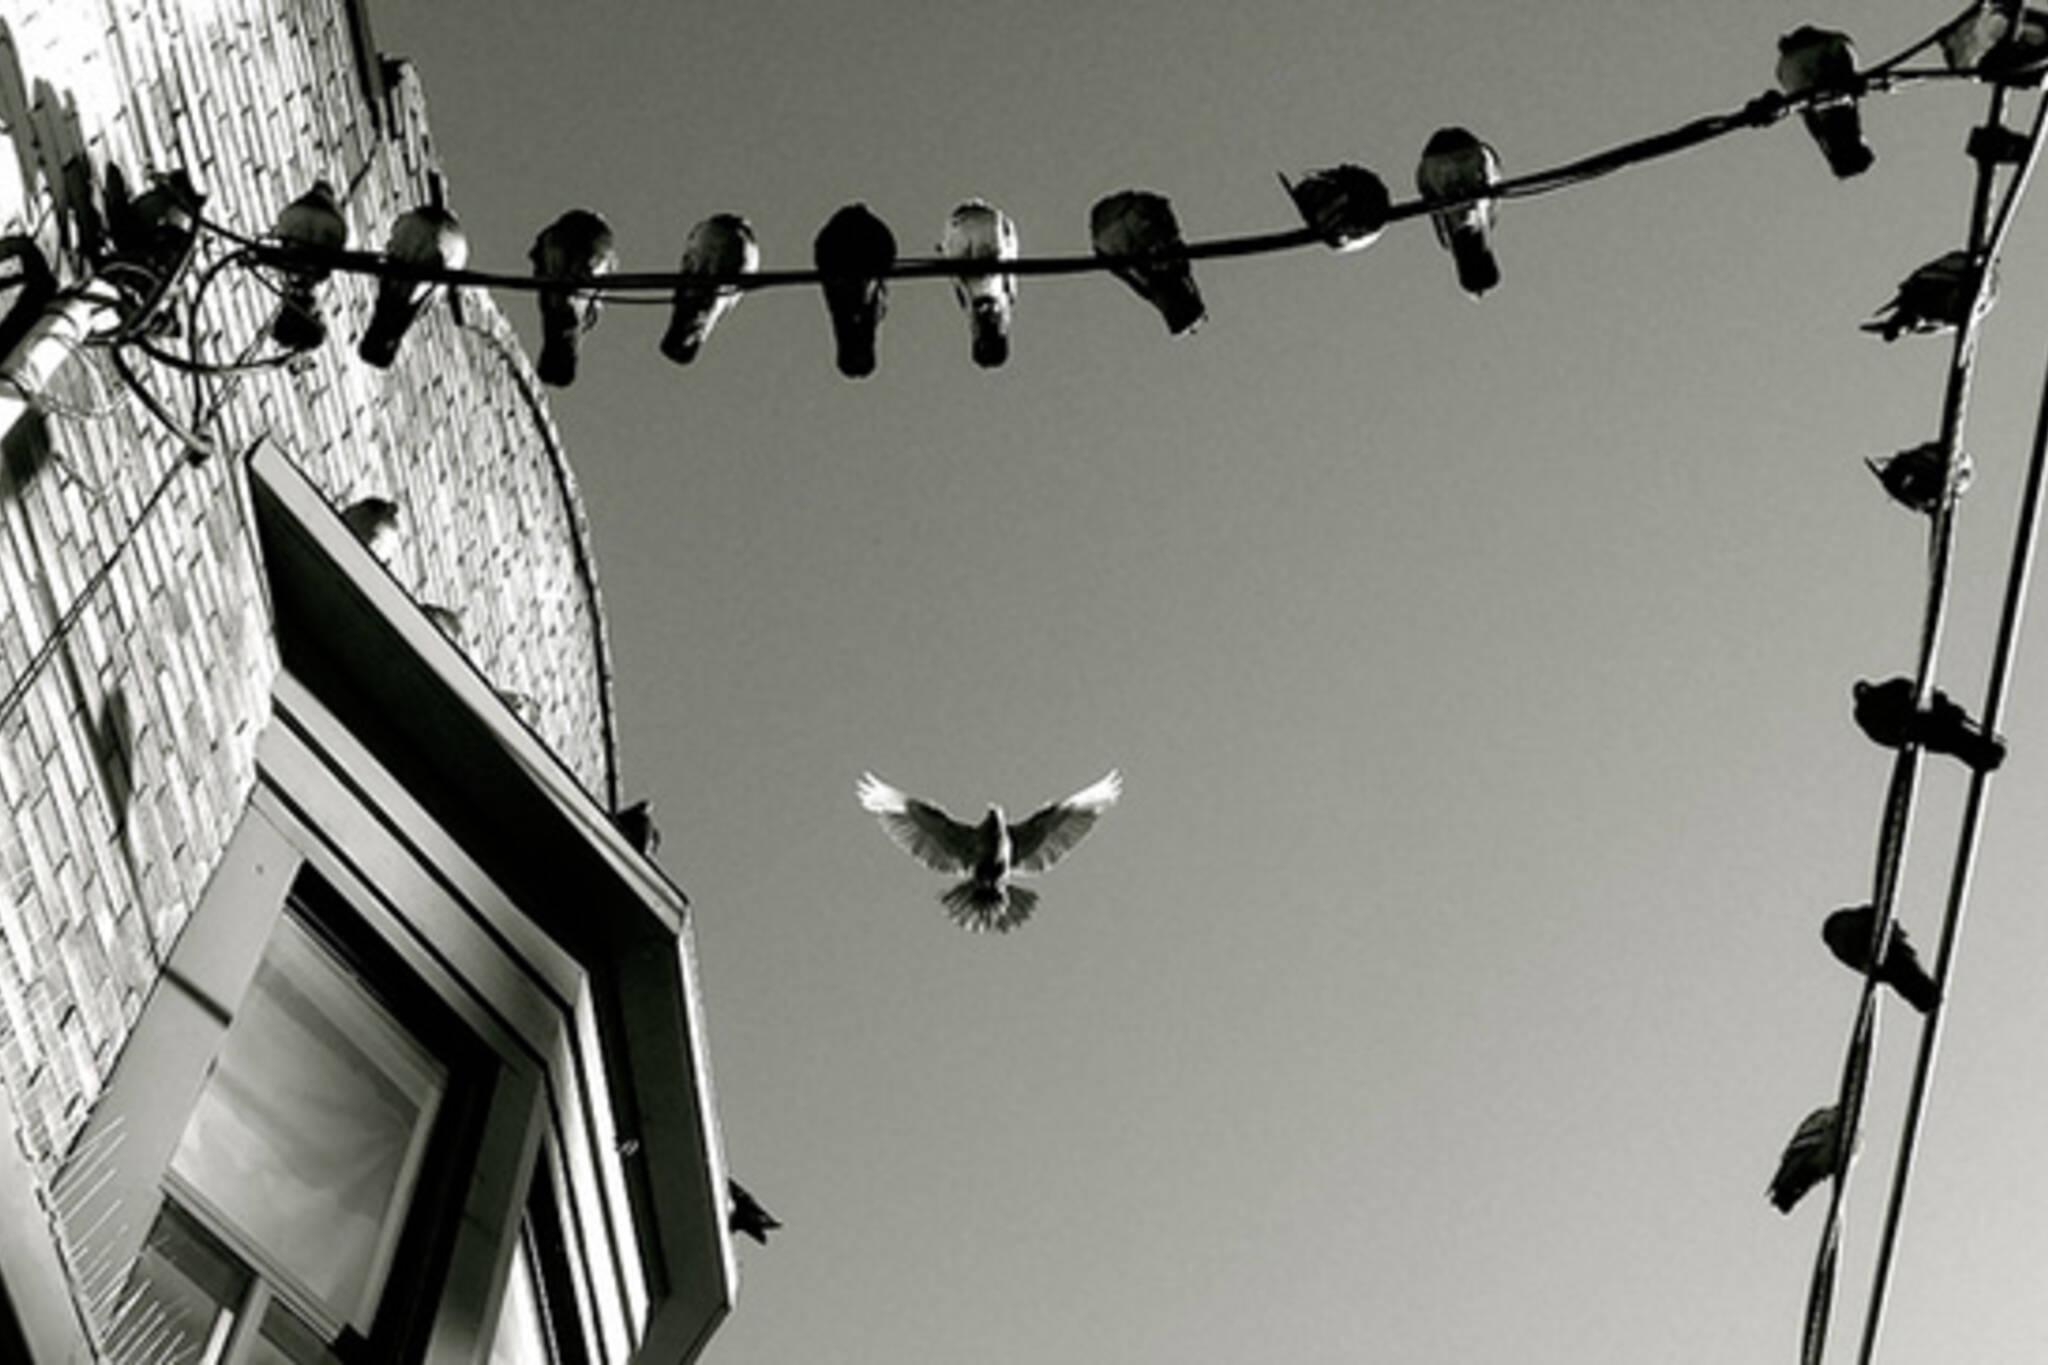 pigeon flying